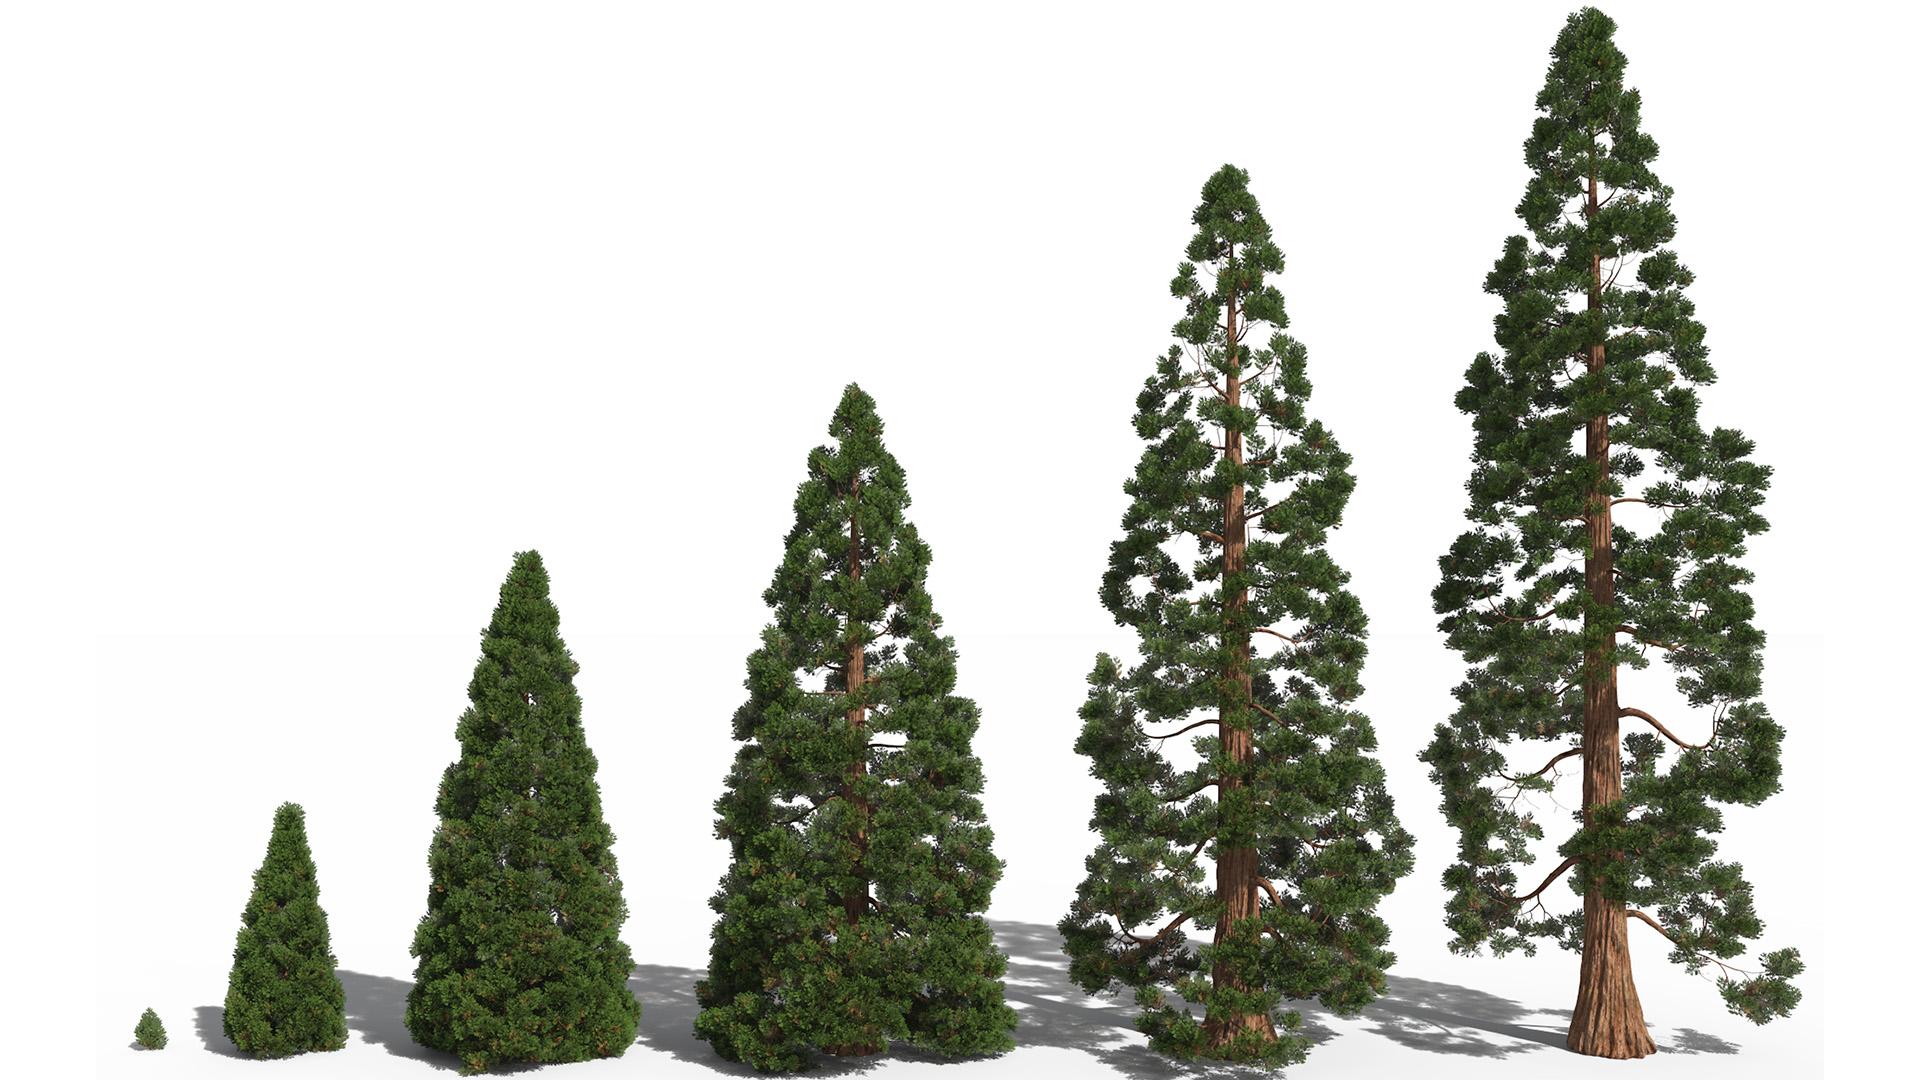 3D model of the Giant sequoia Sequoiadendron giganteum maturity variations